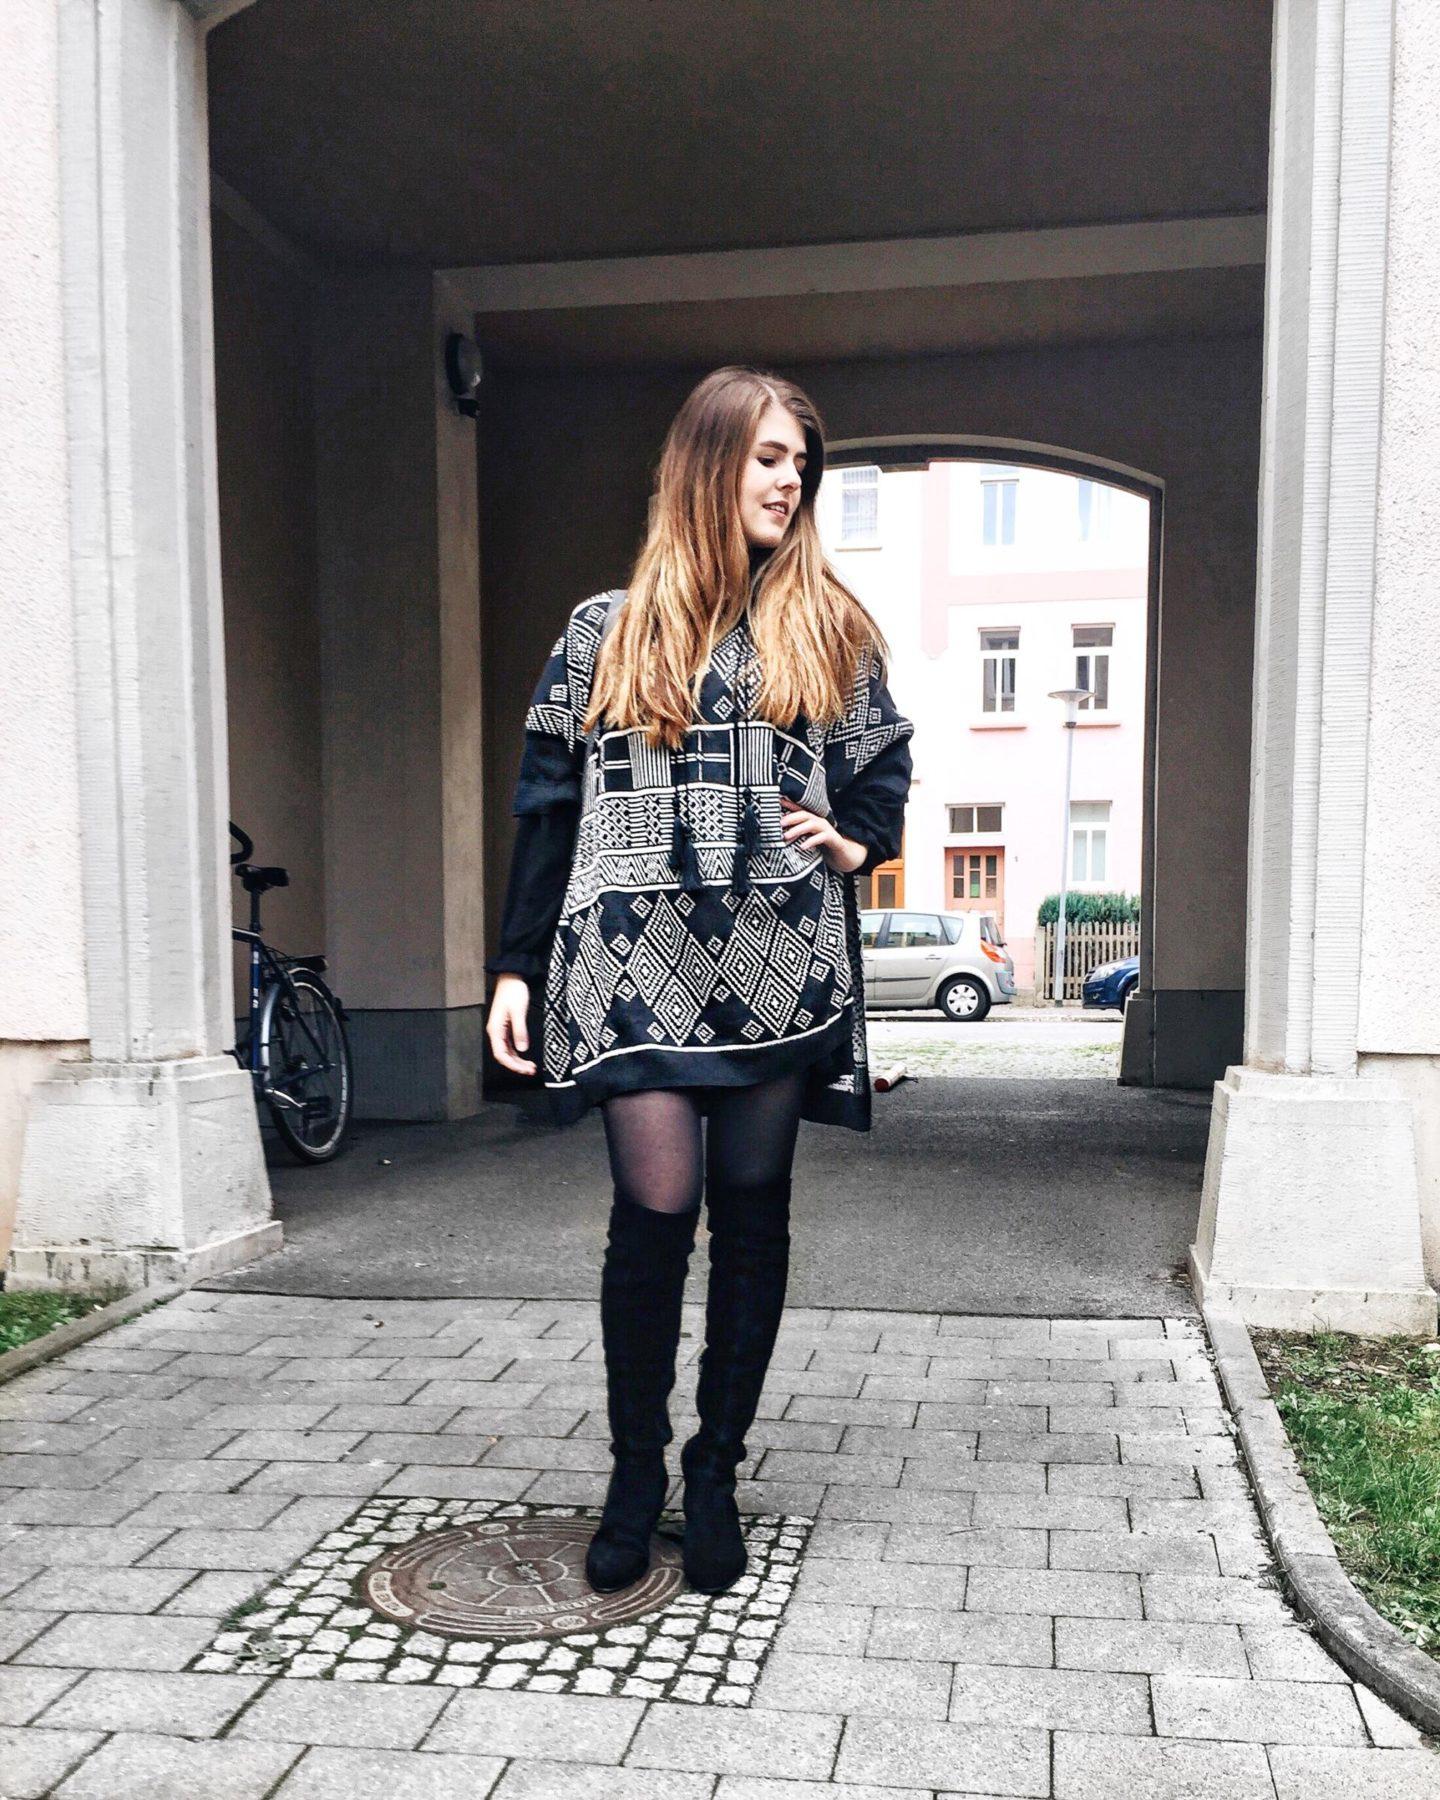 Meine Instagram Looks #1 – Hallo Herbst